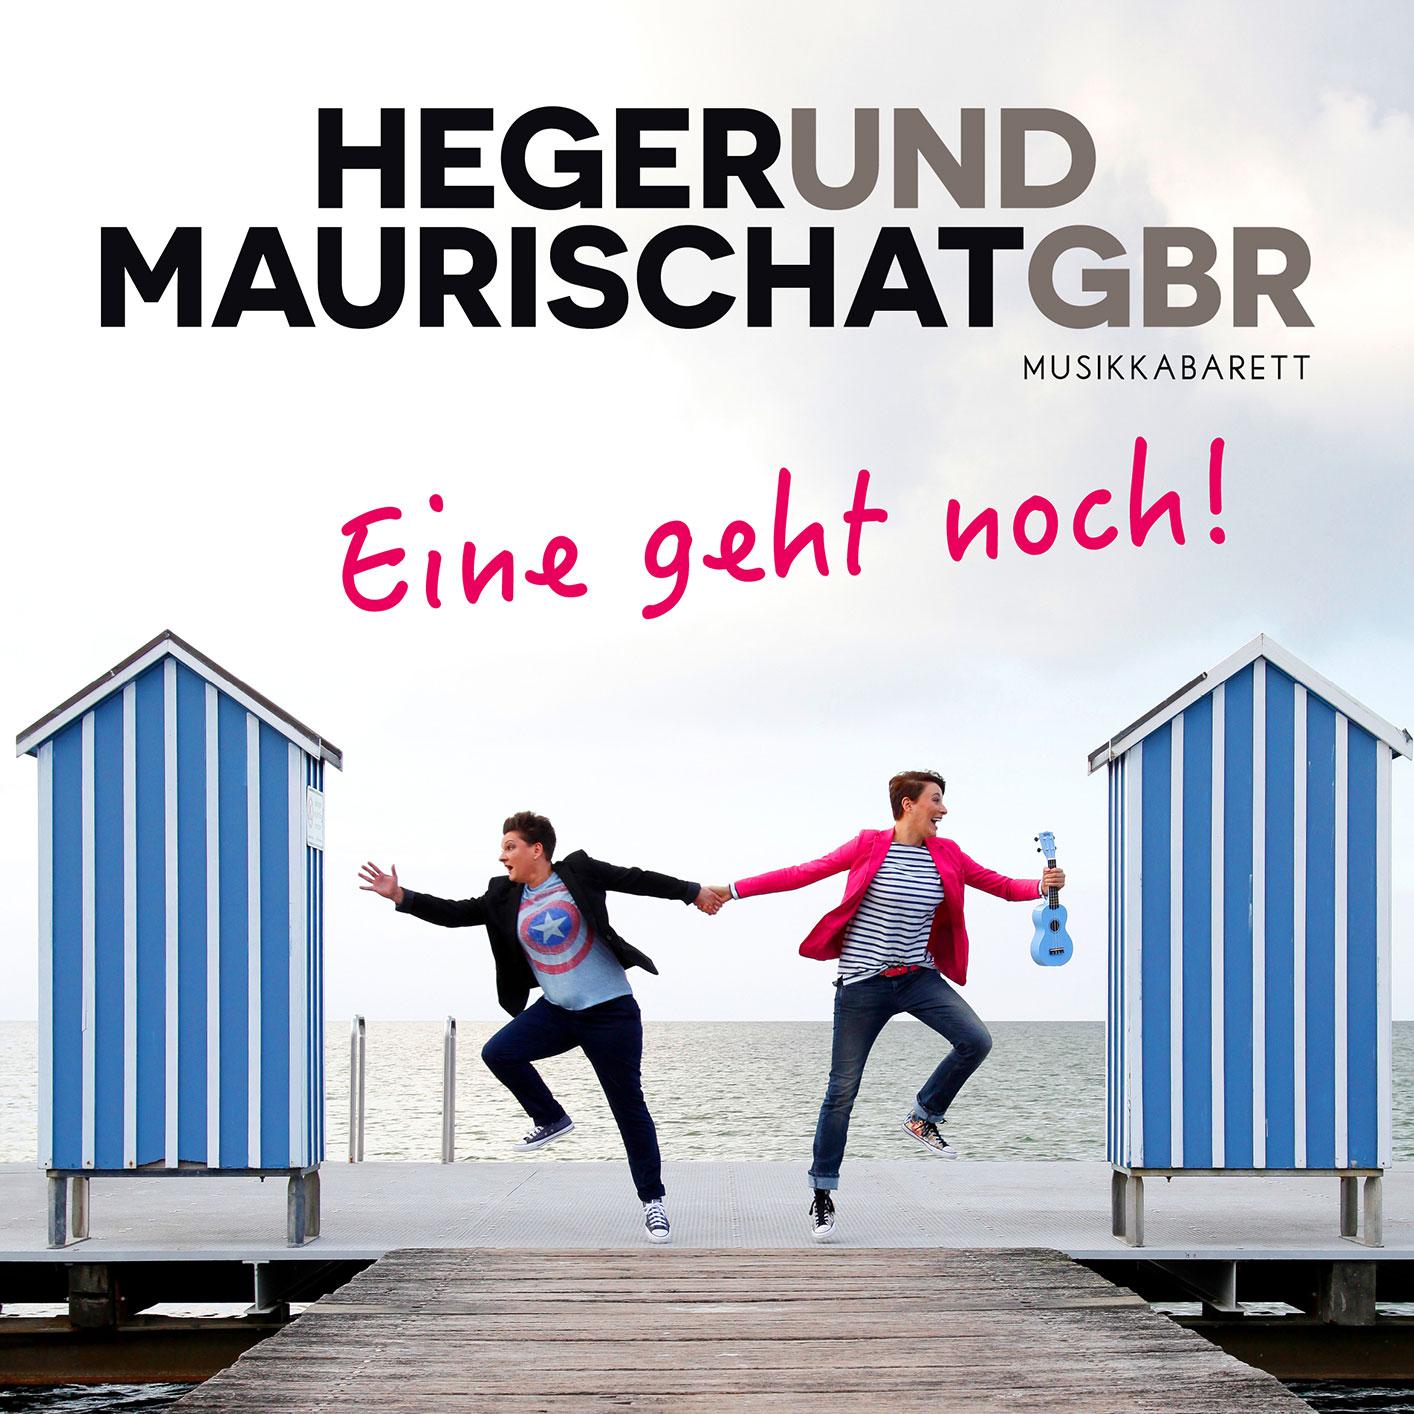 "heger-maurischat"" width="